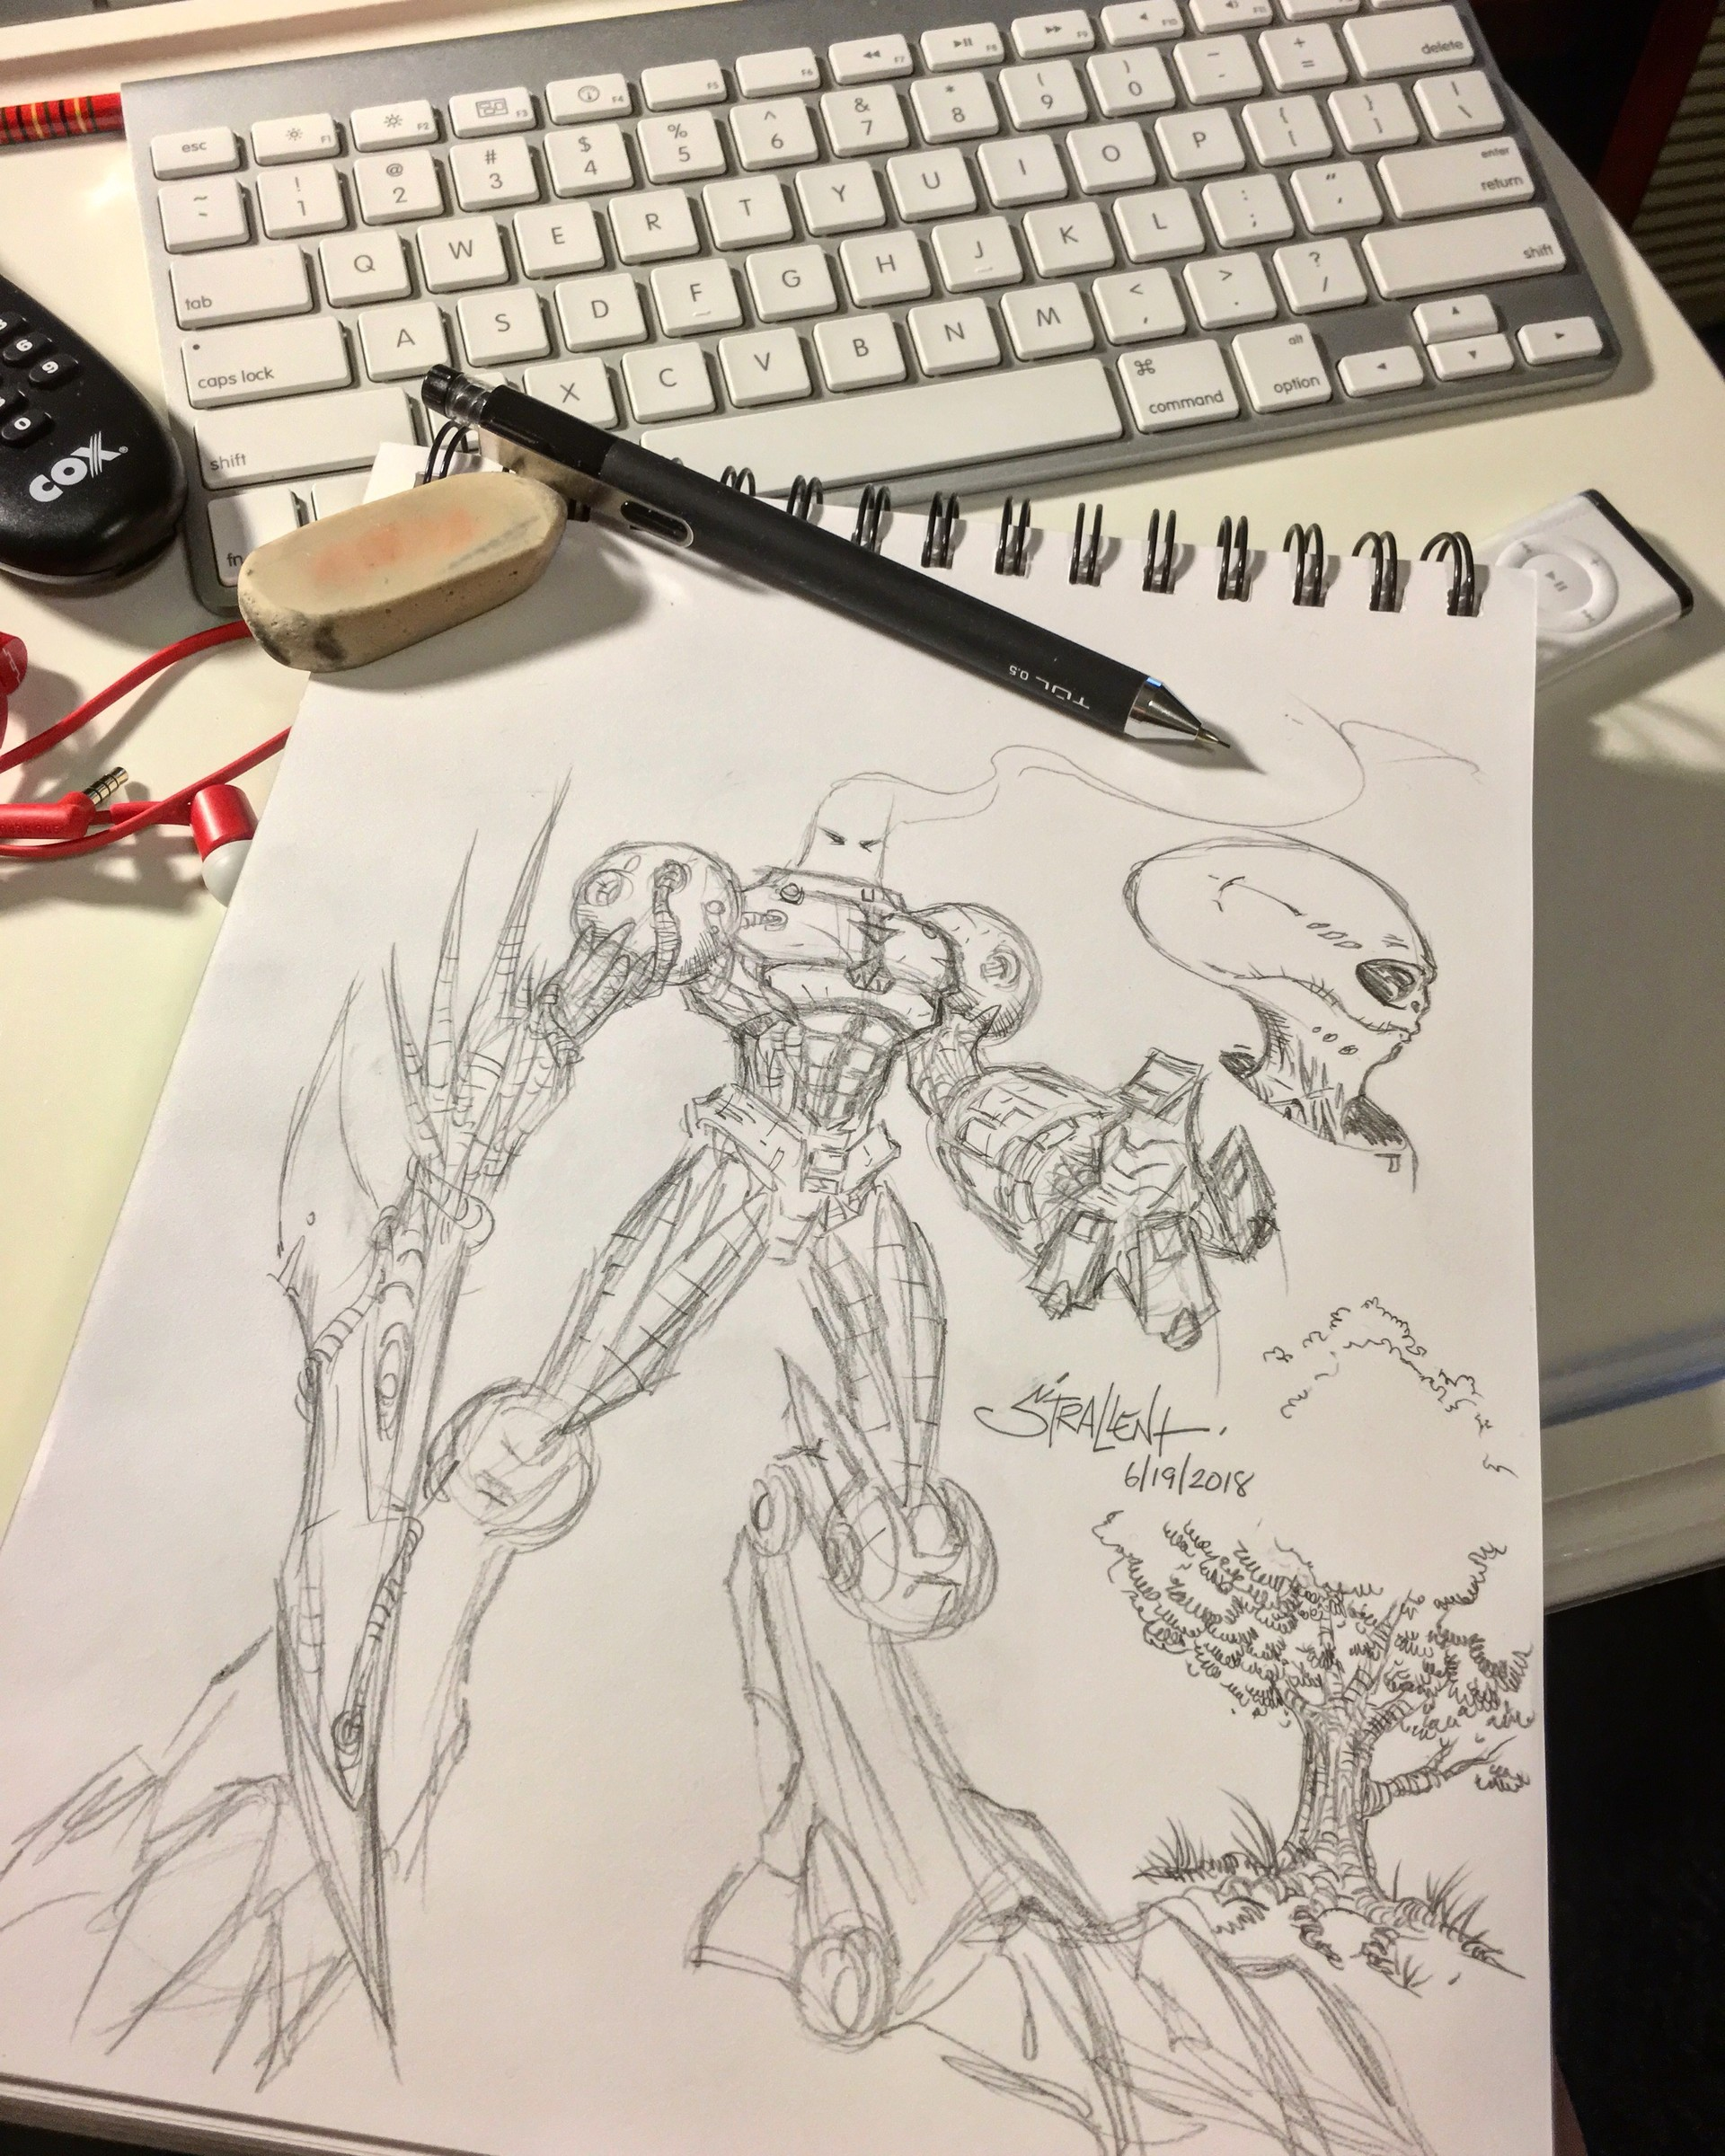 ArtStation - Quick Sketch, Frank Strallent